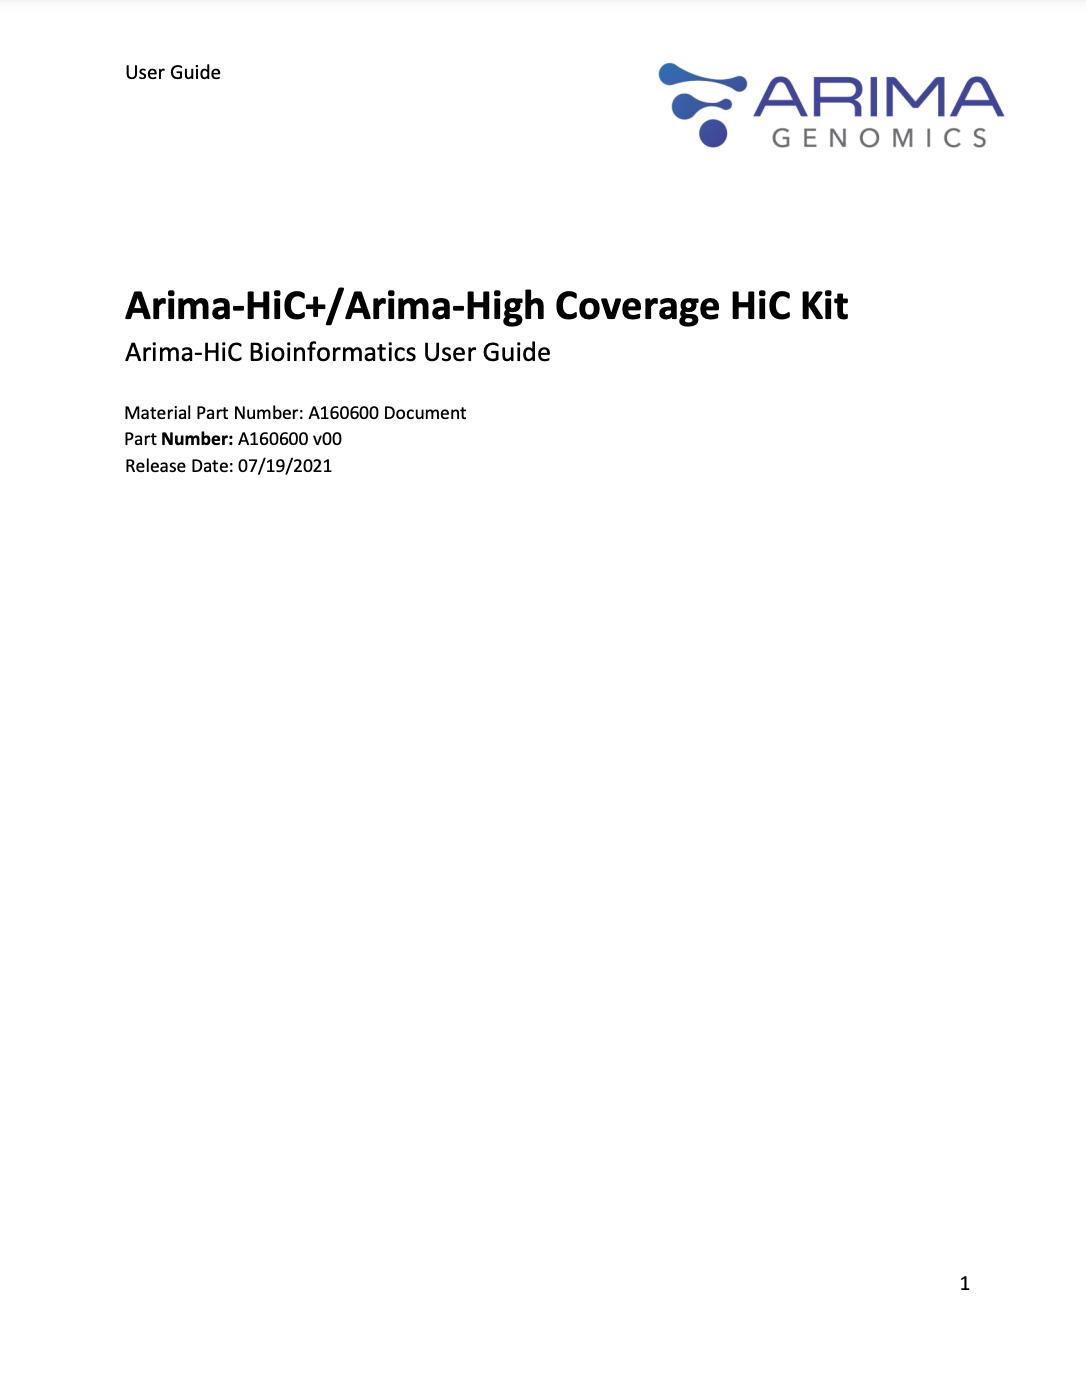 Arima Bioinformatics User Guide